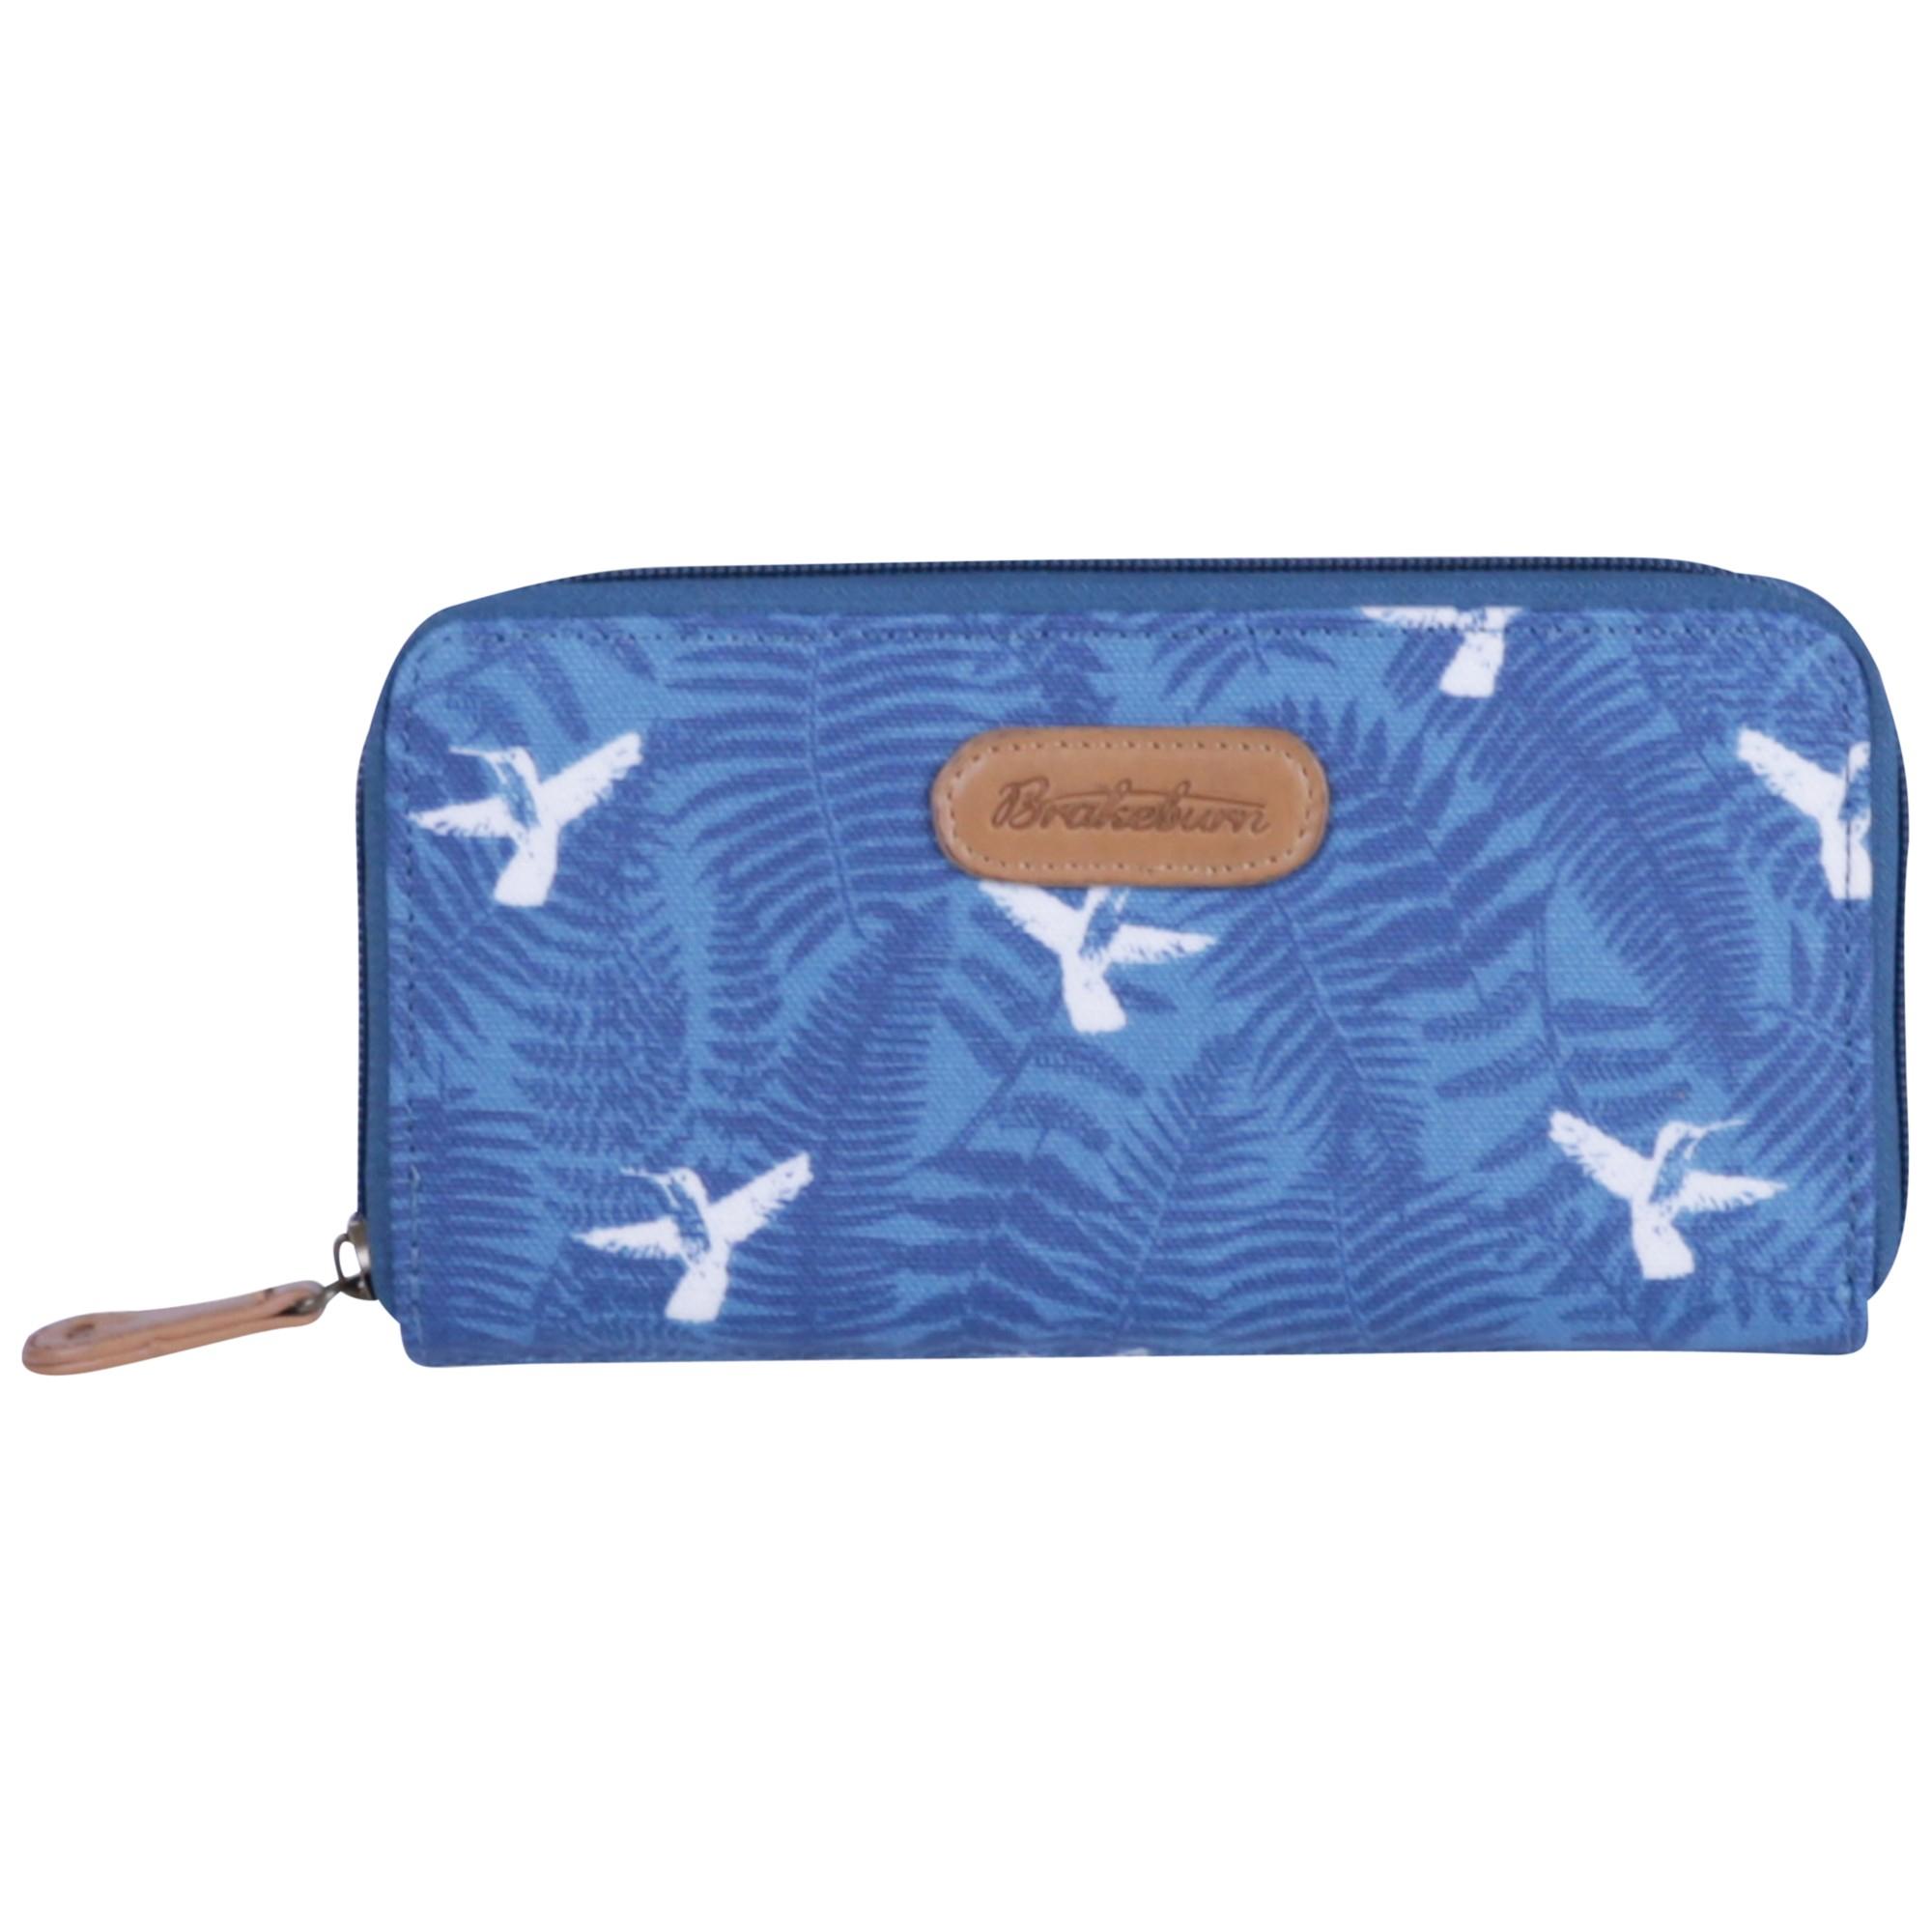 17e6a5fb27ae Brakeburn Hummingbird Fern Large Coated Canvas Purse in Blue - Lyst